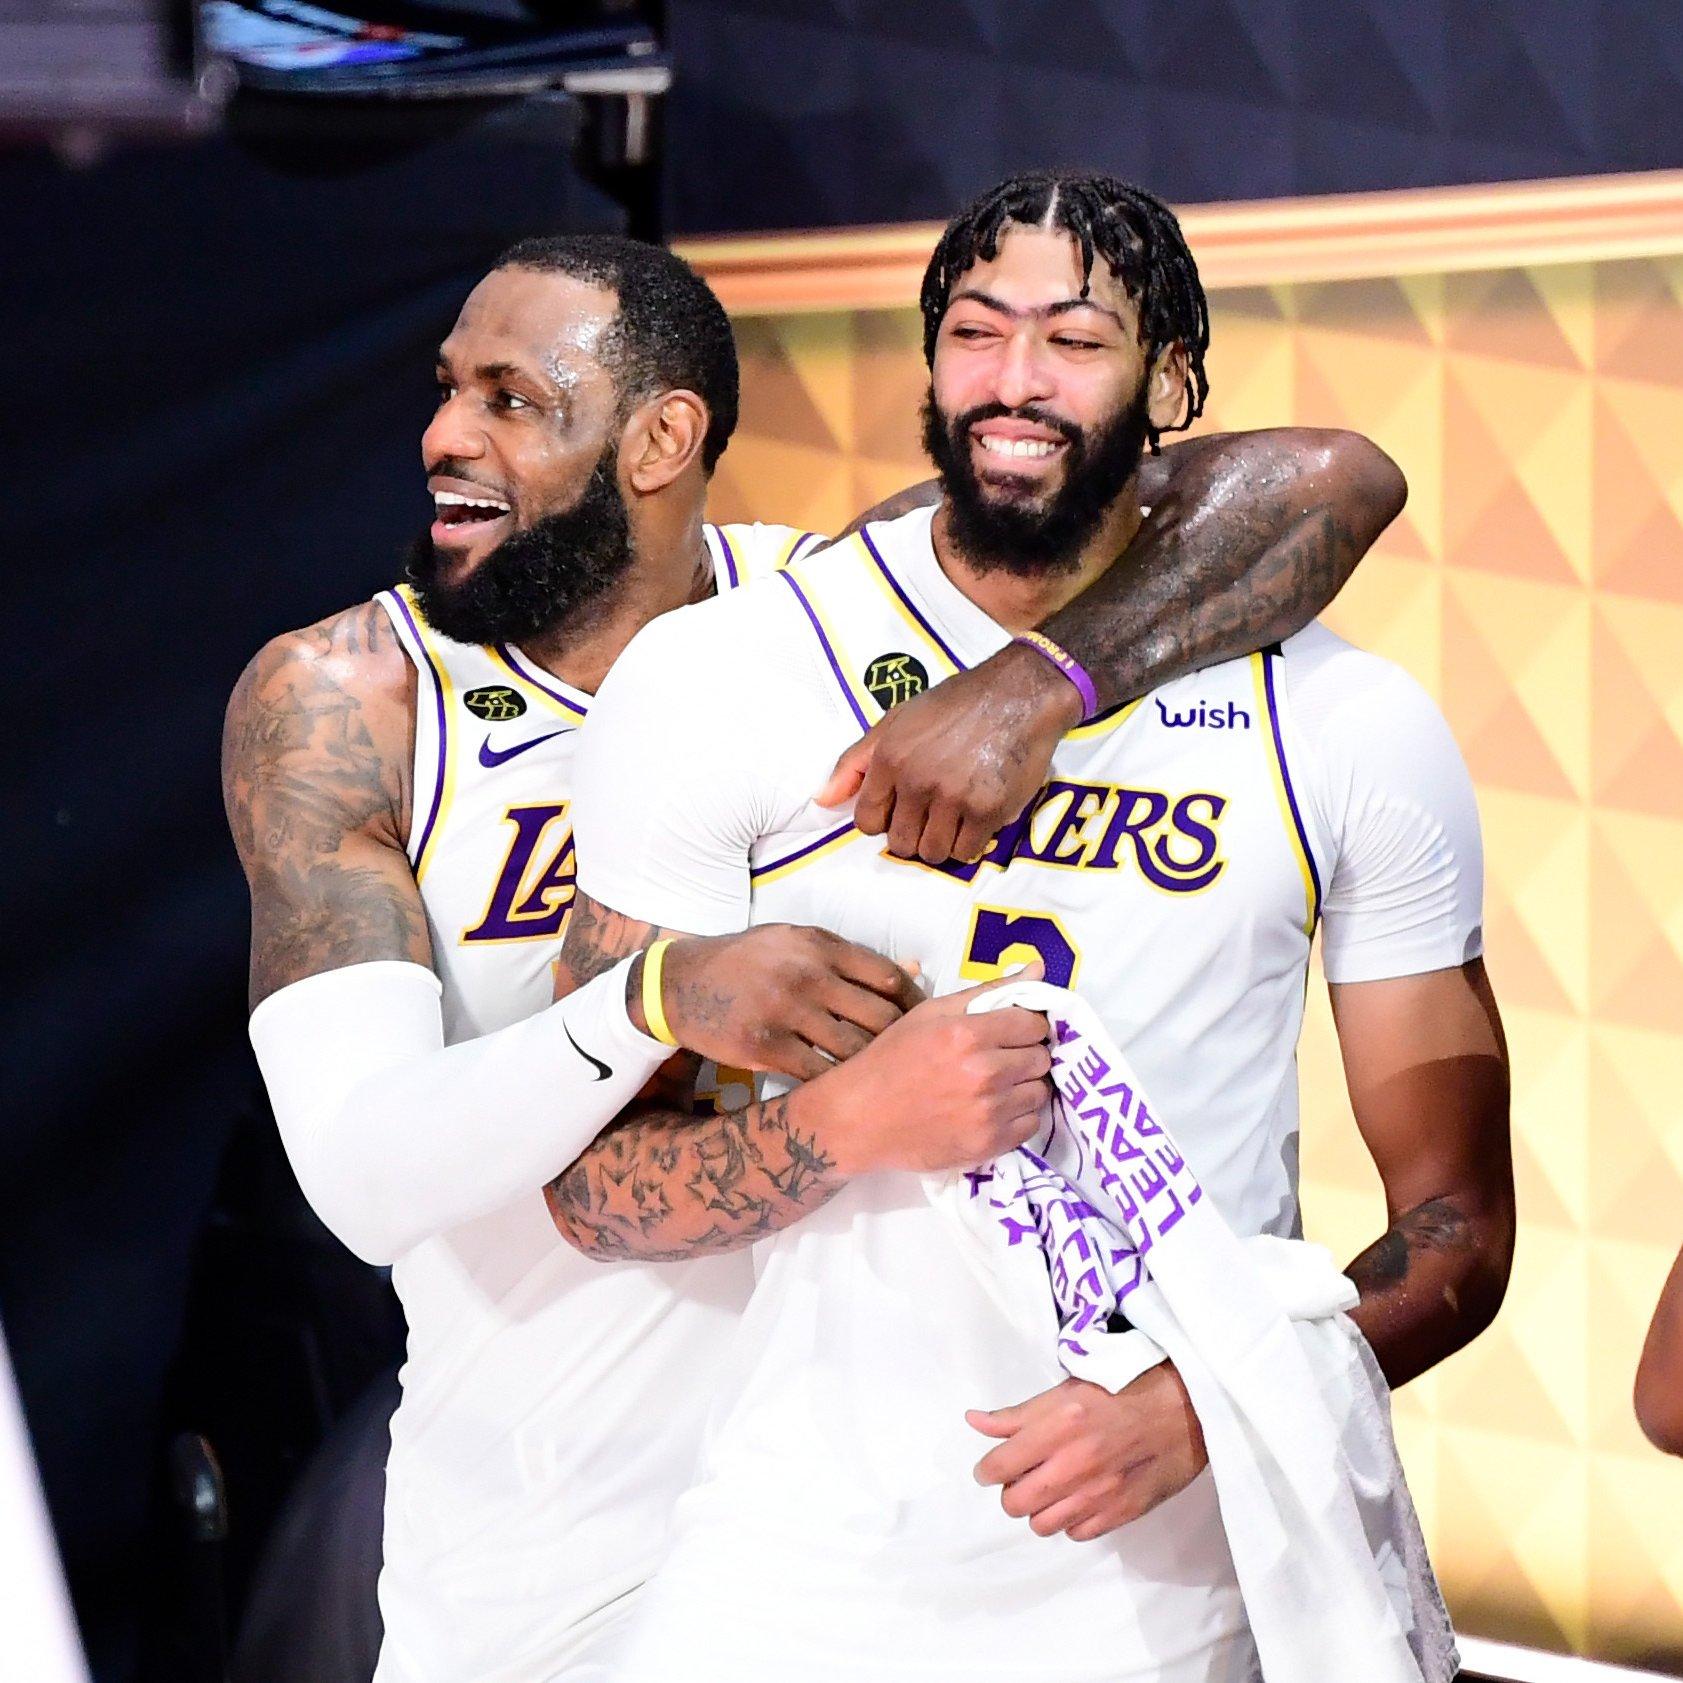 Los Angeles Lakers Nba Champions 2020 Wallpapers Wallpaper Cave